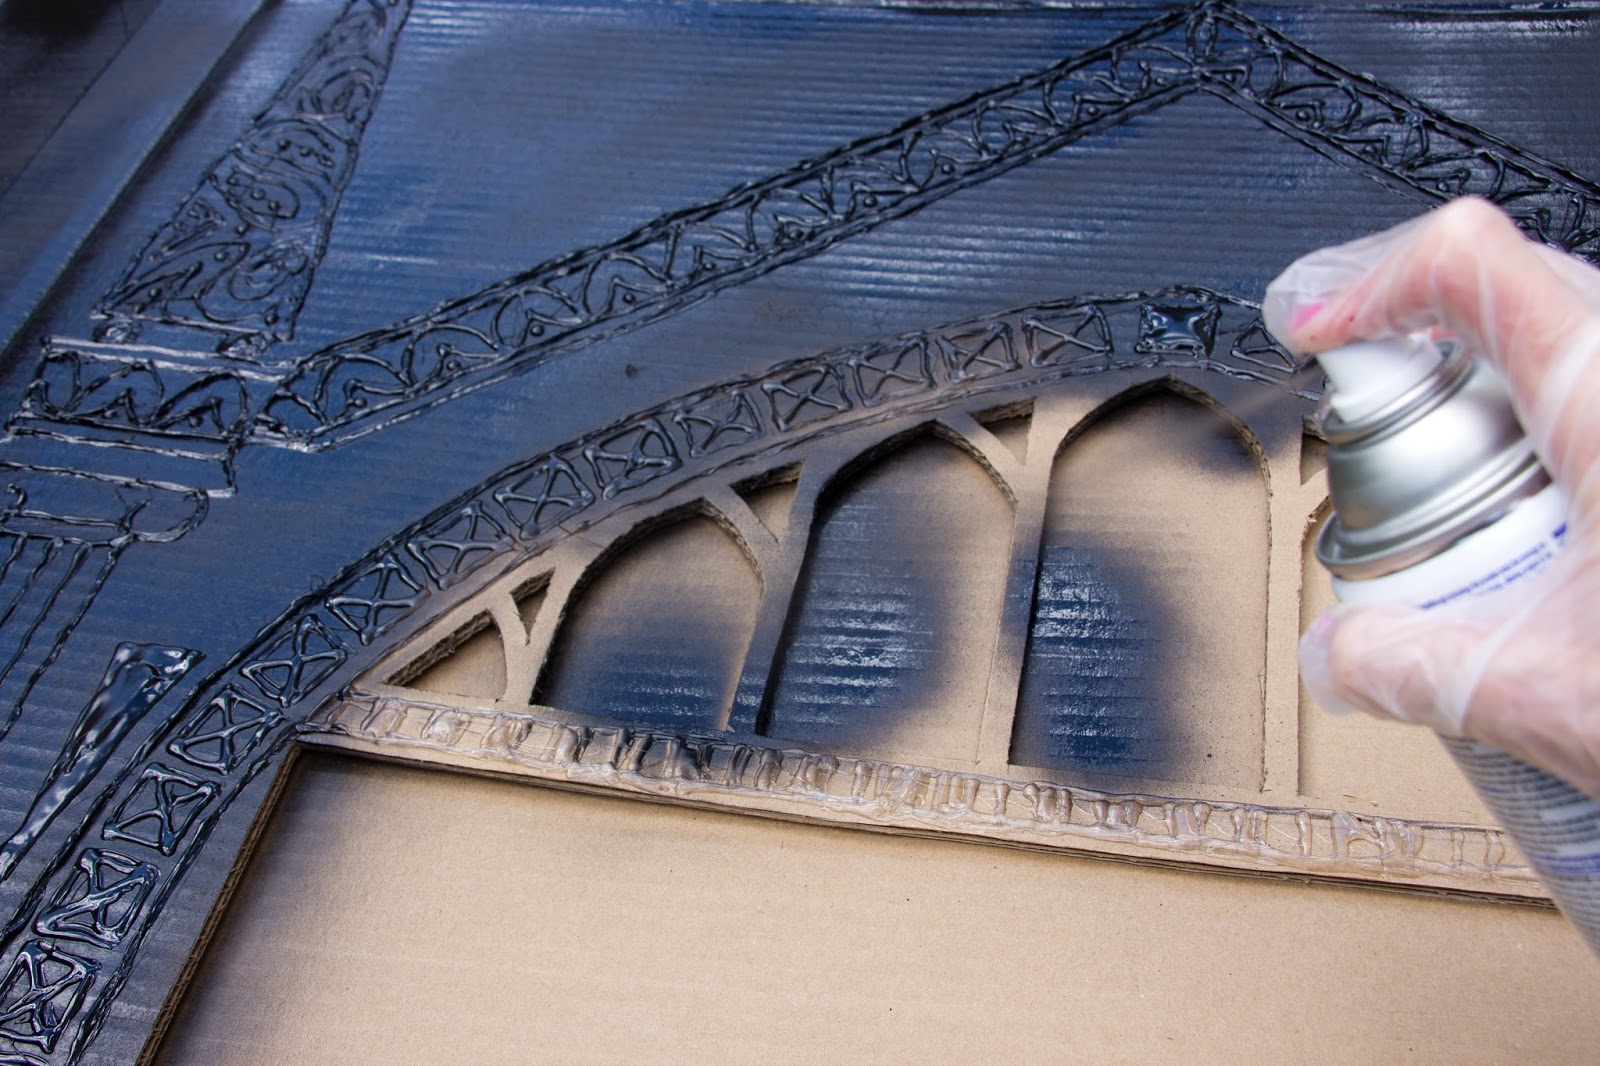 Delicious Reads DIY Harry Potter Cardboard Mirror of